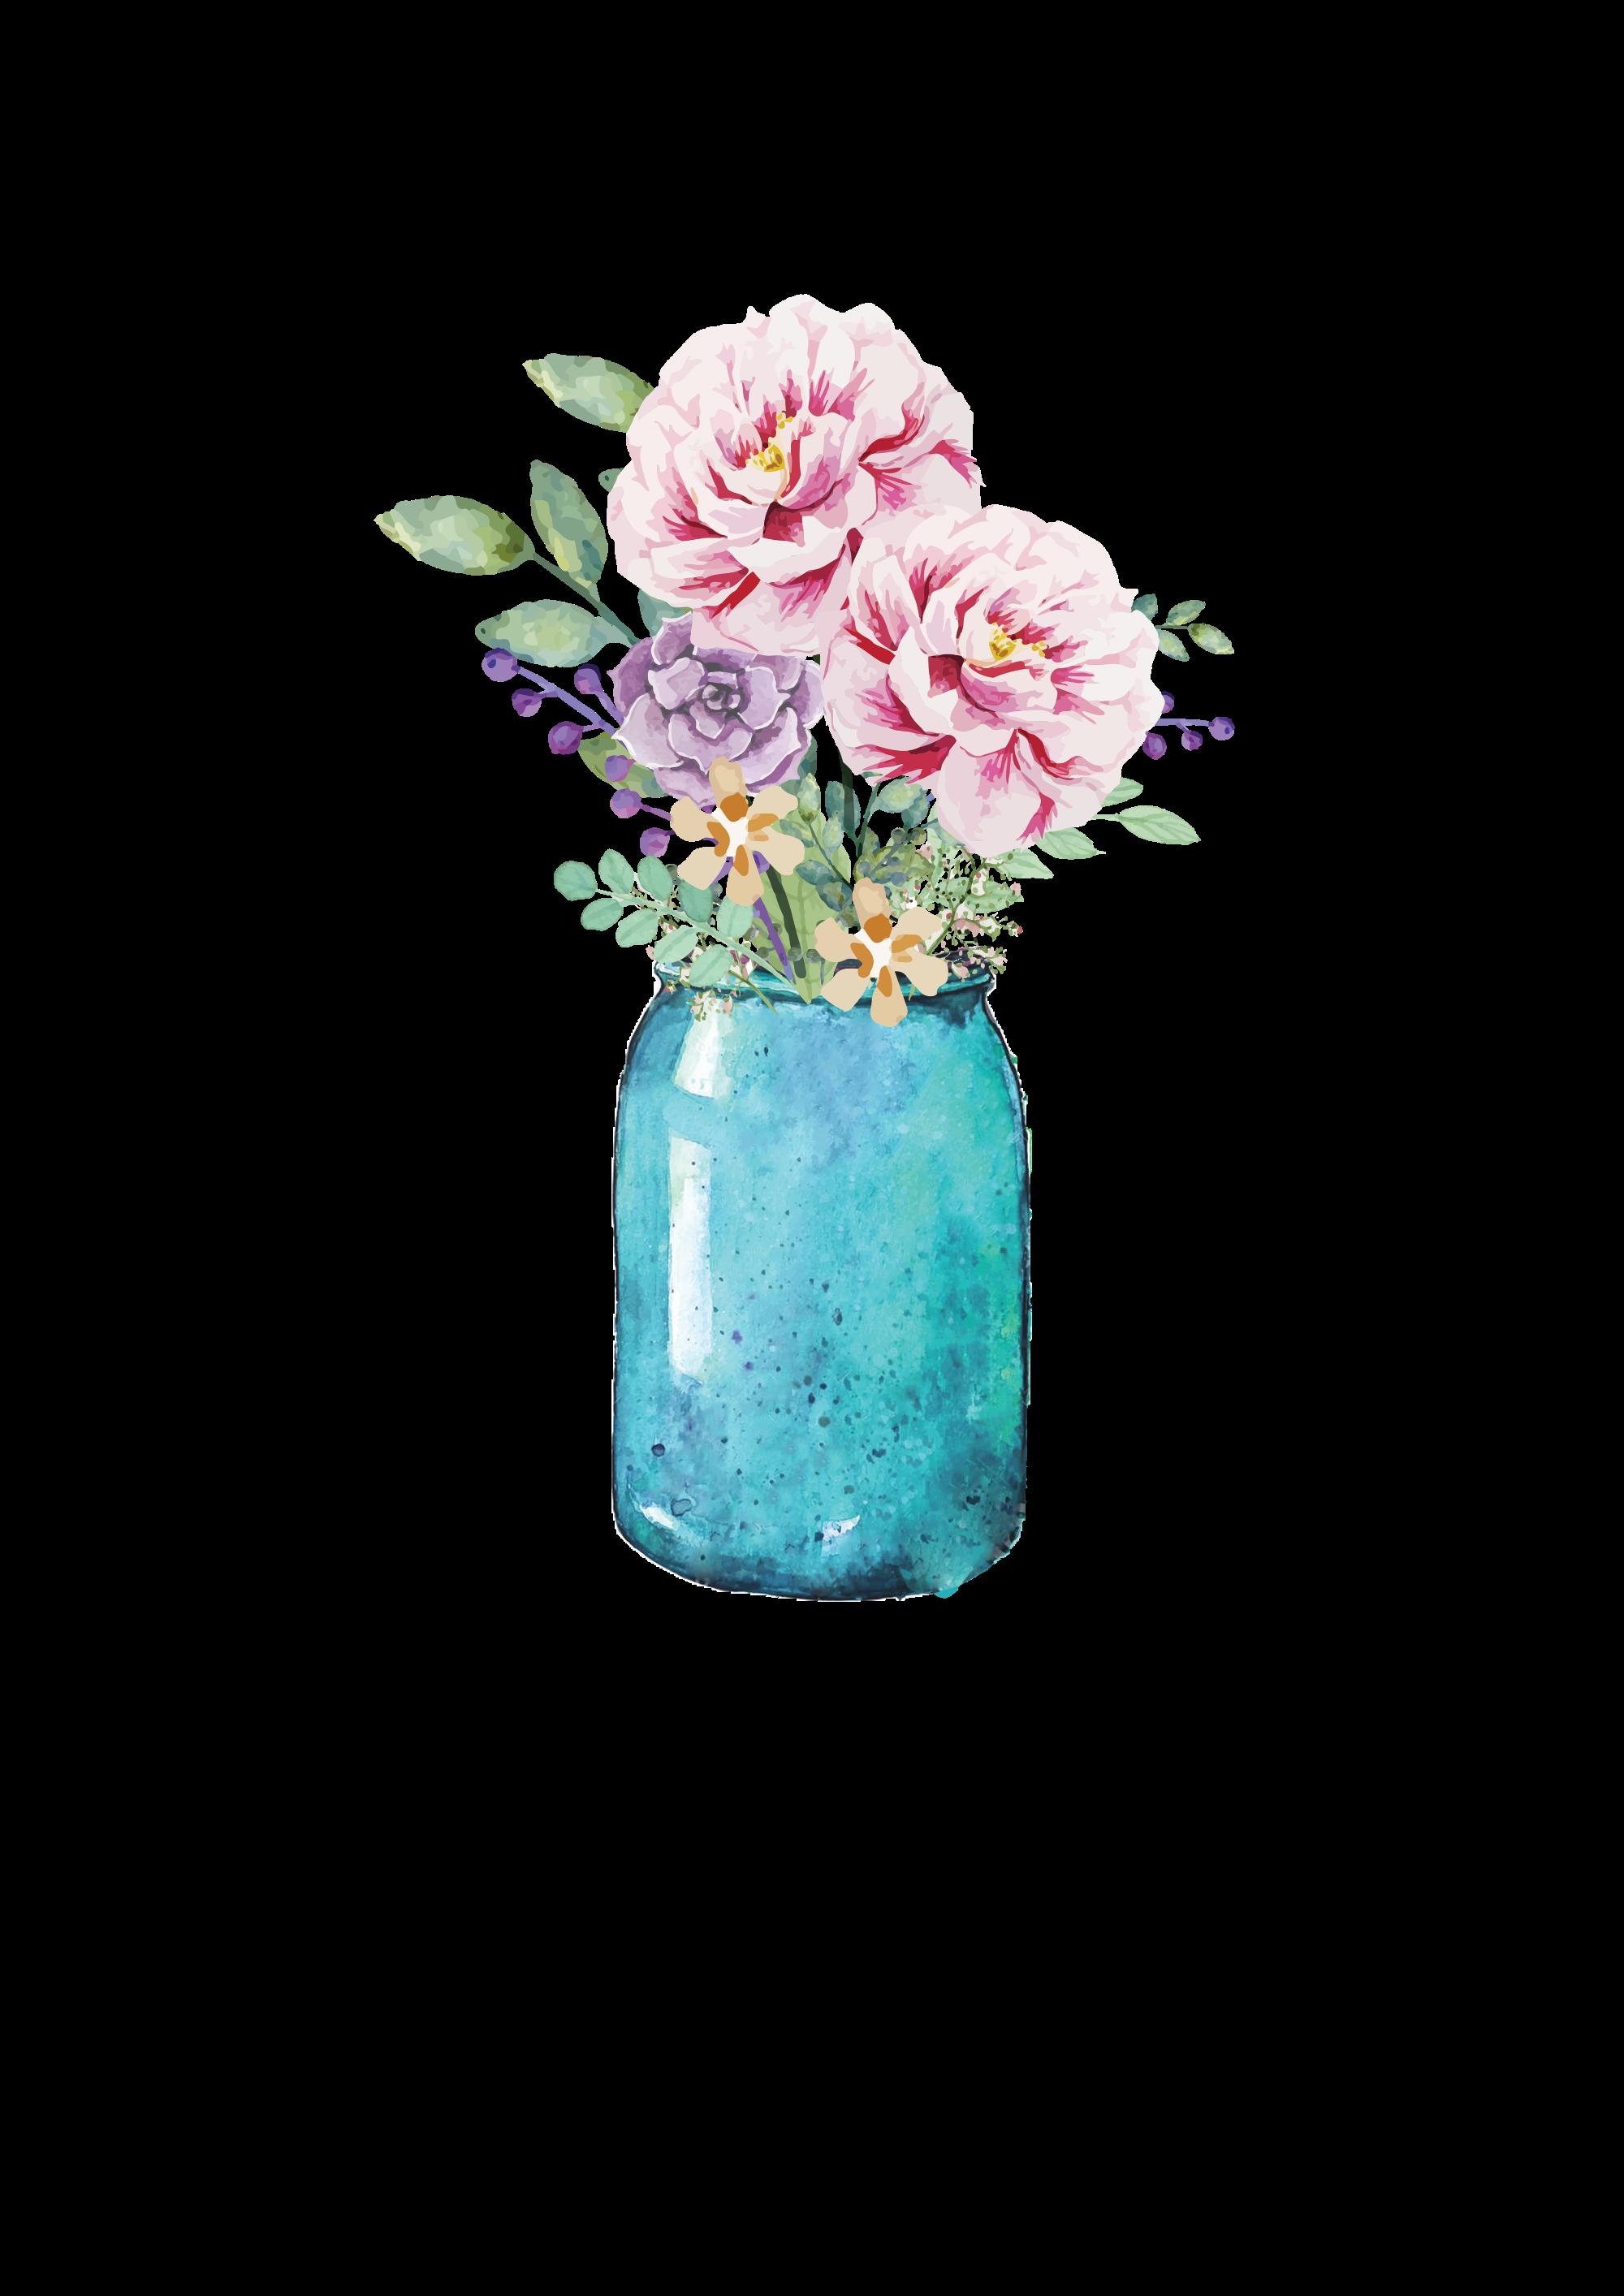 lauren baxter flowers in a mason jar wallpaper. Black Bedroom Furniture Sets. Home Design Ideas